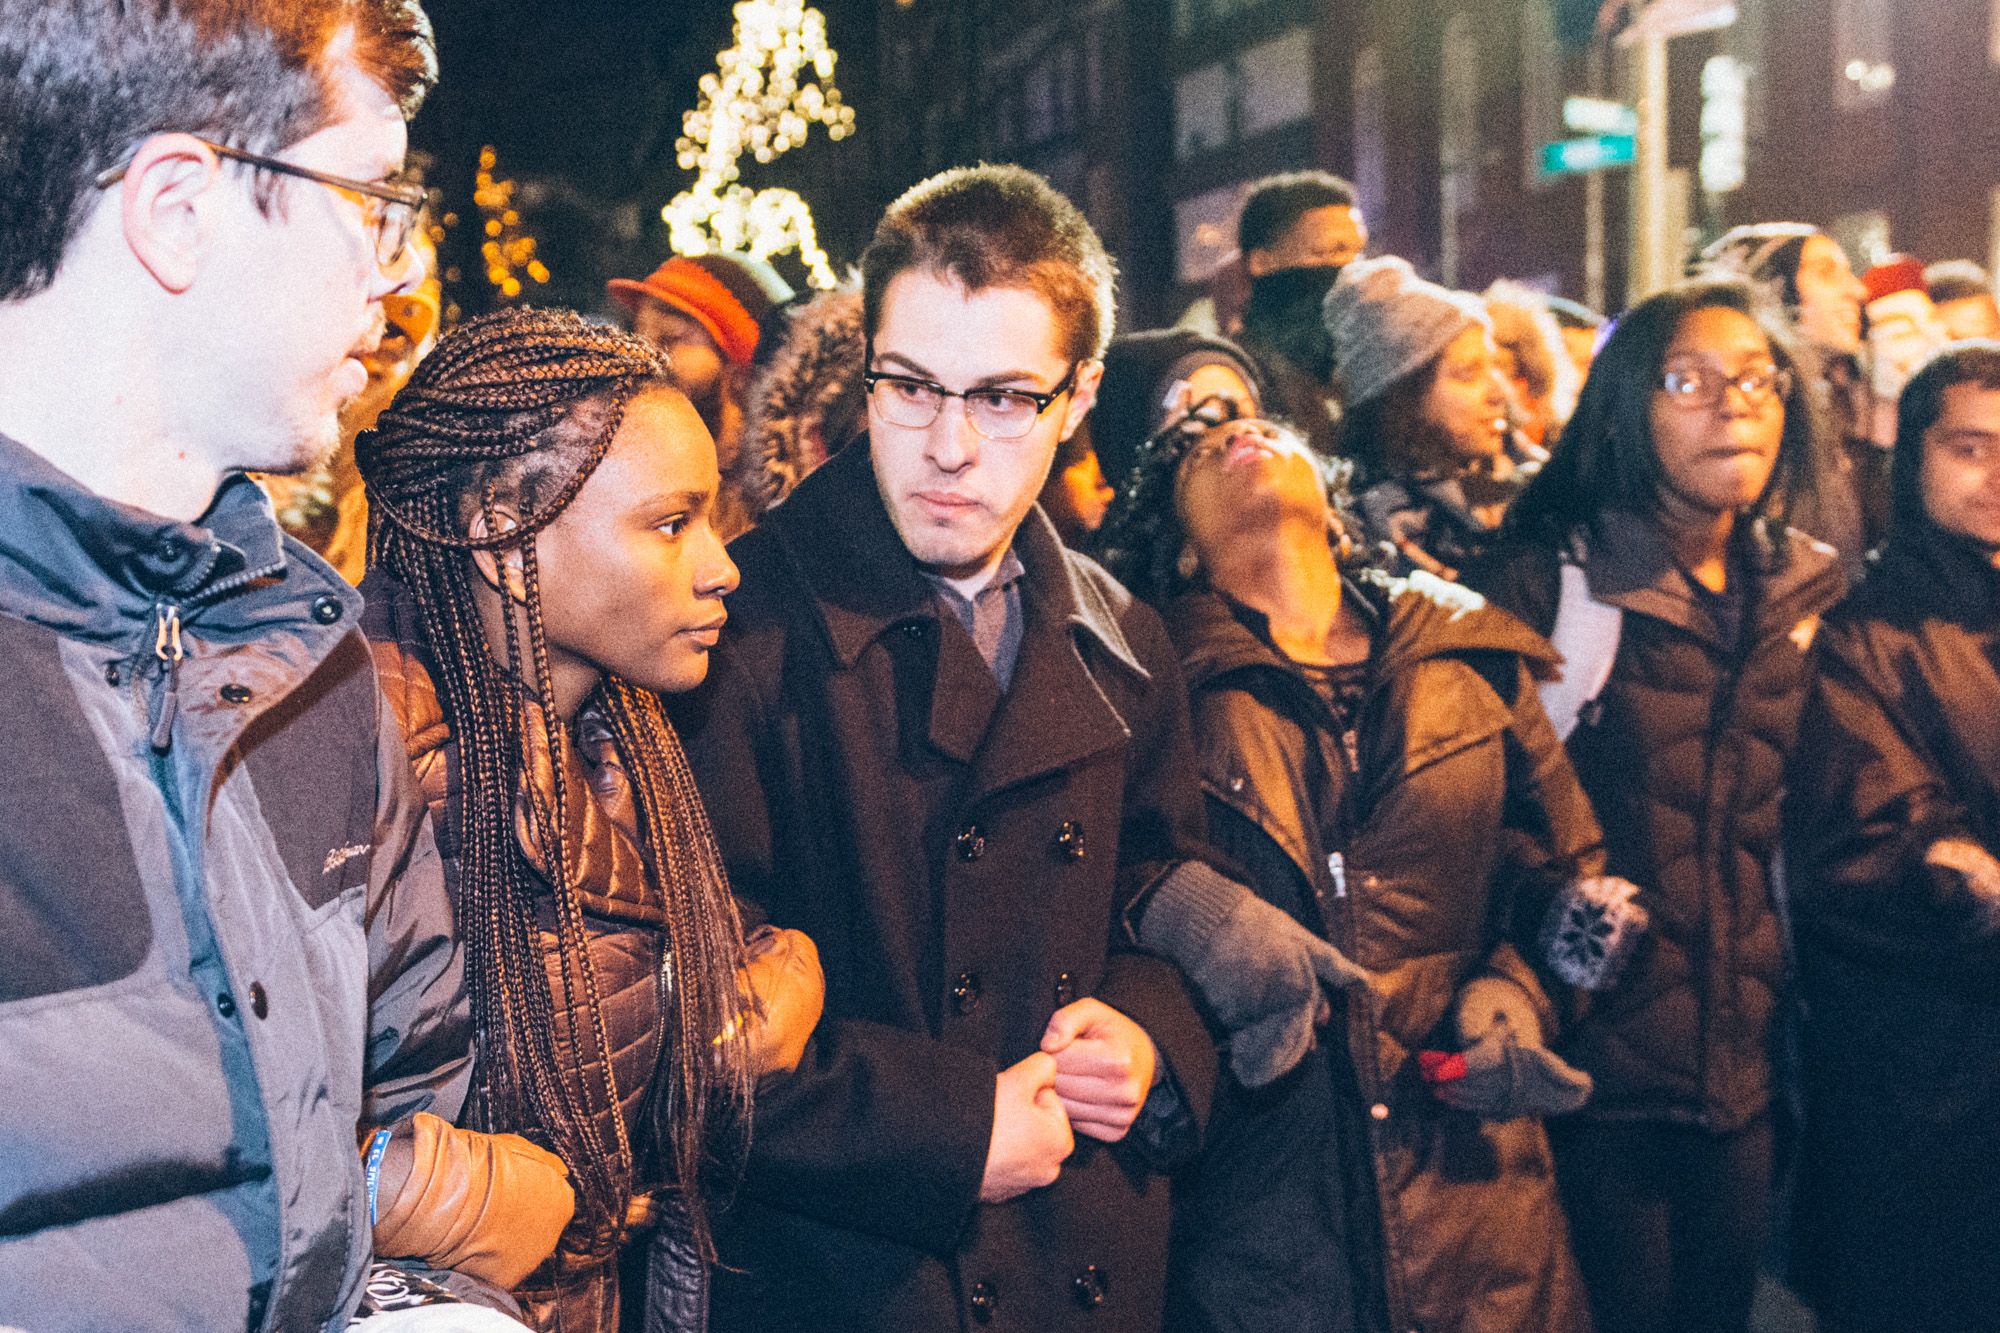 Protesters arm-in-arm listening to Rev. Sekou speak.